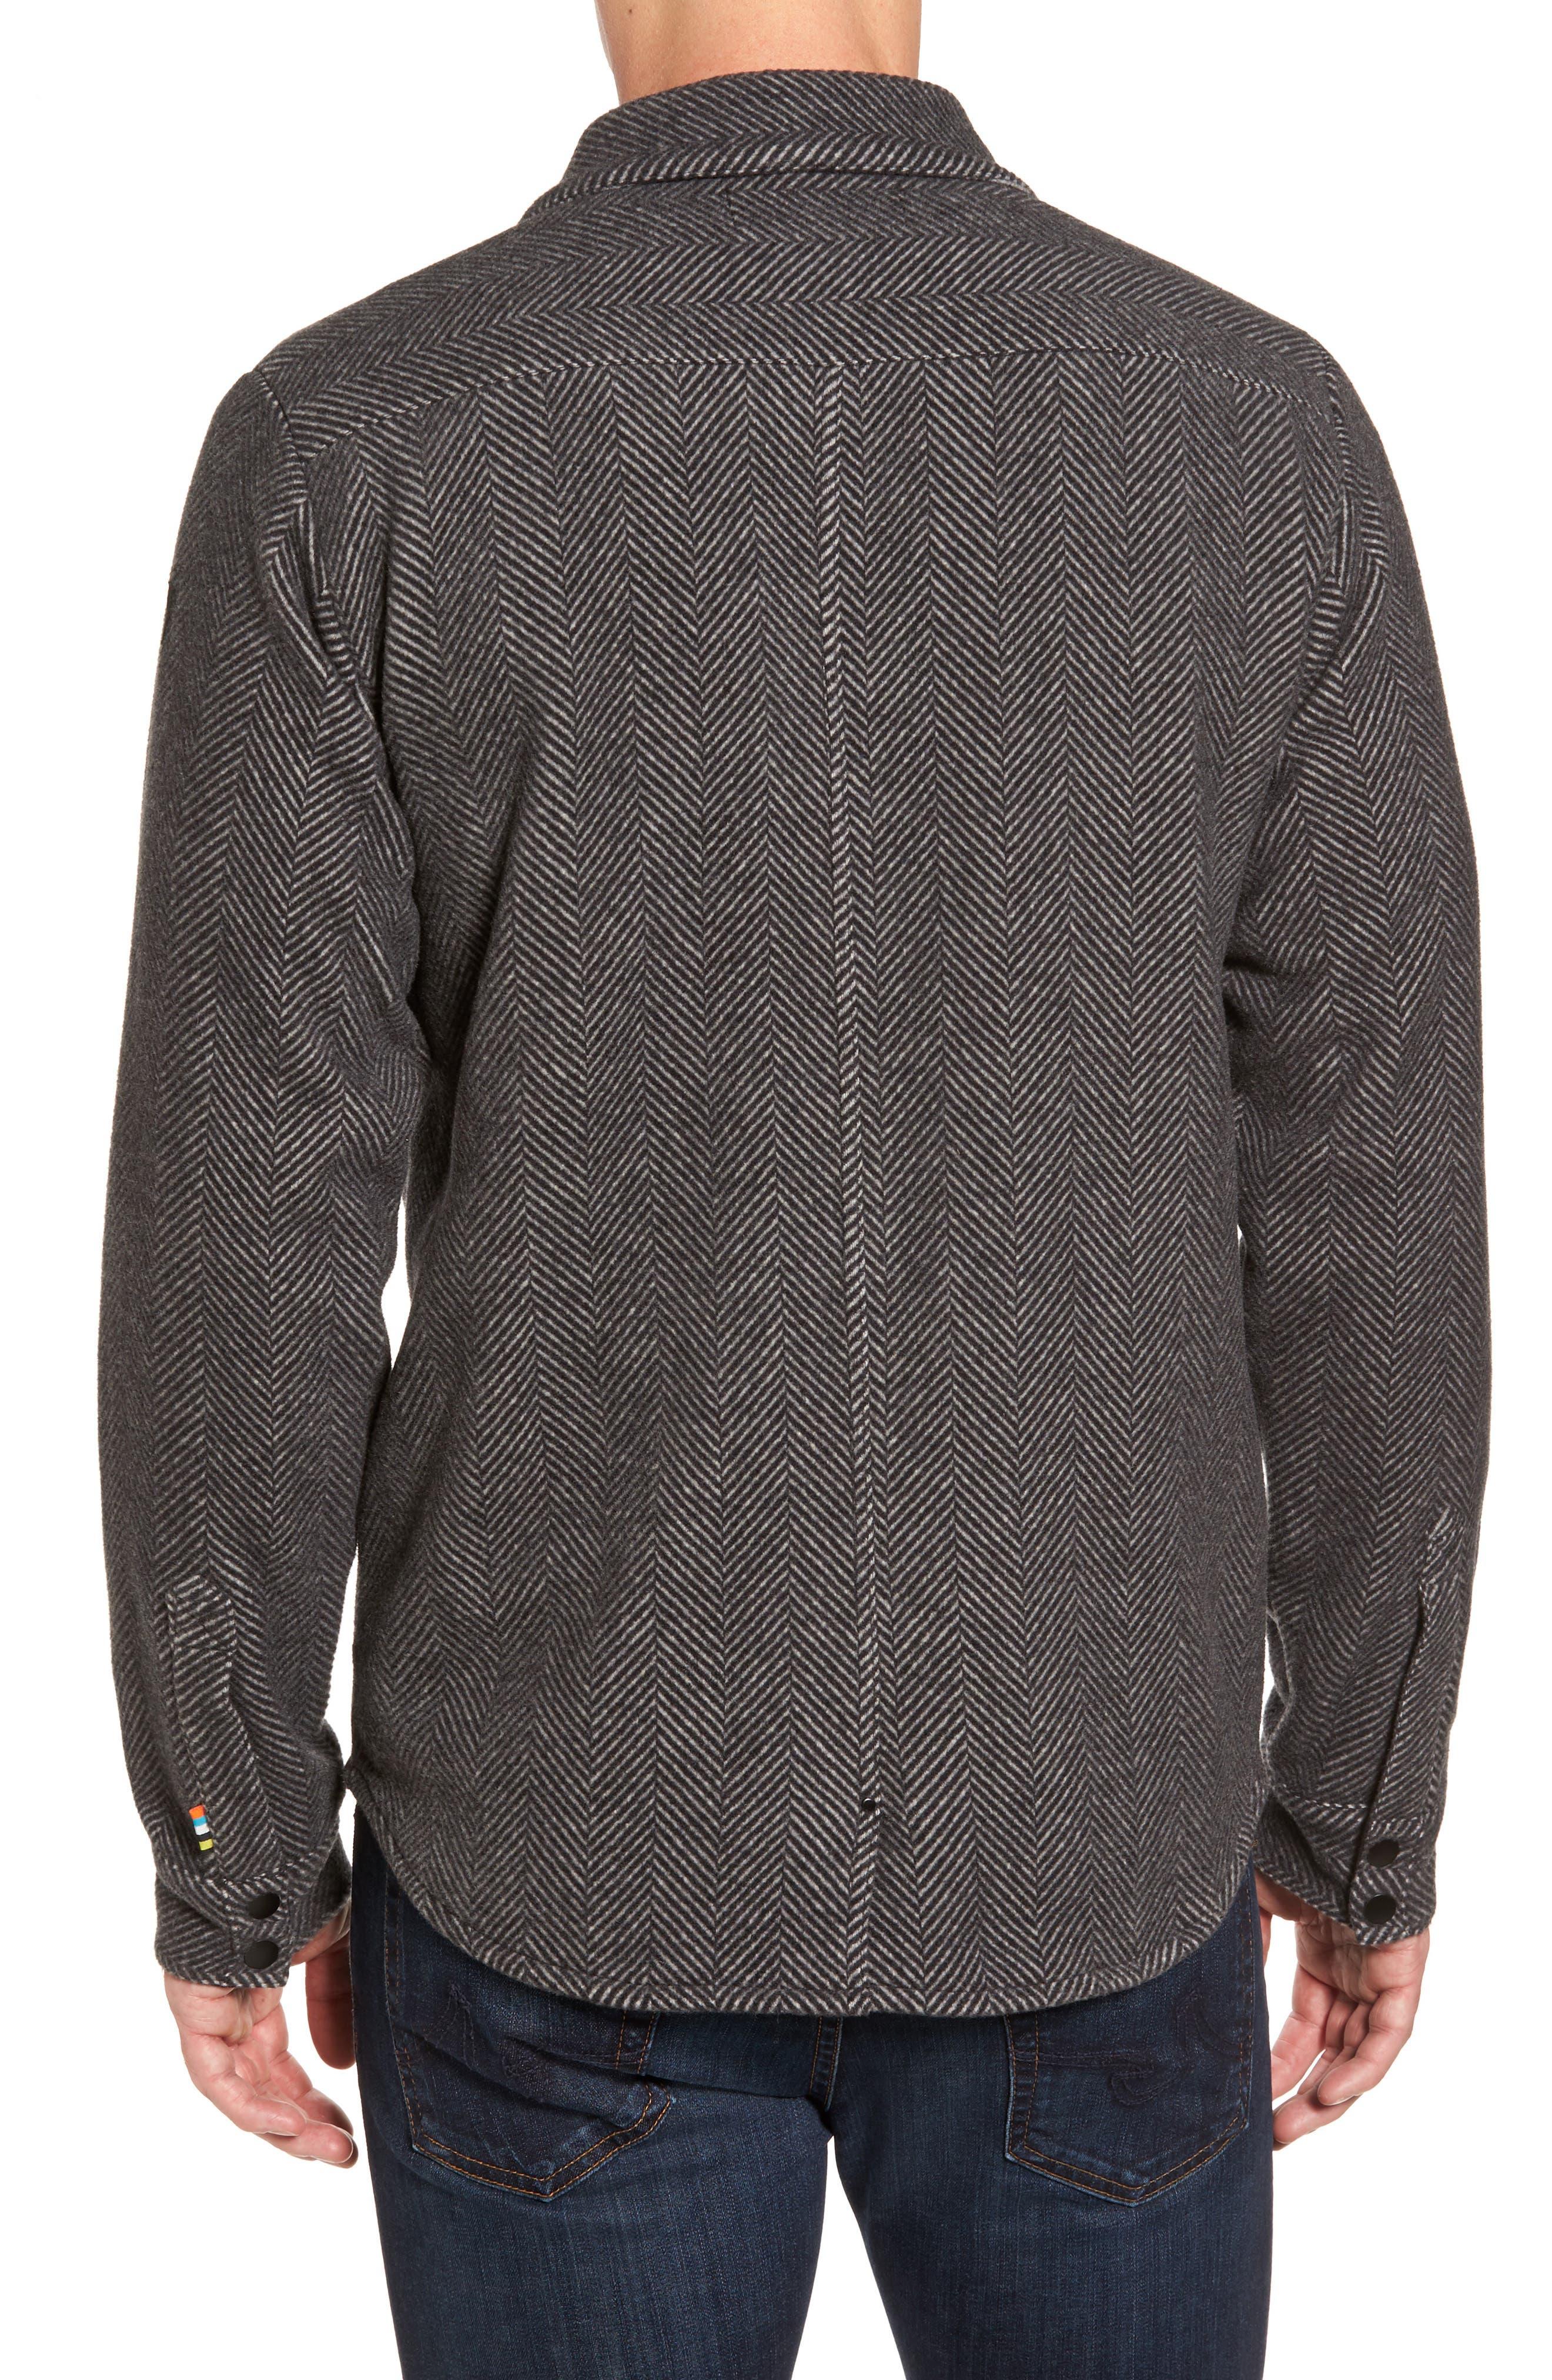 Anchor Line Herringbone Wool Blend Shirt Jacket,                             Alternate thumbnail 2, color,                             Charcoal Heather